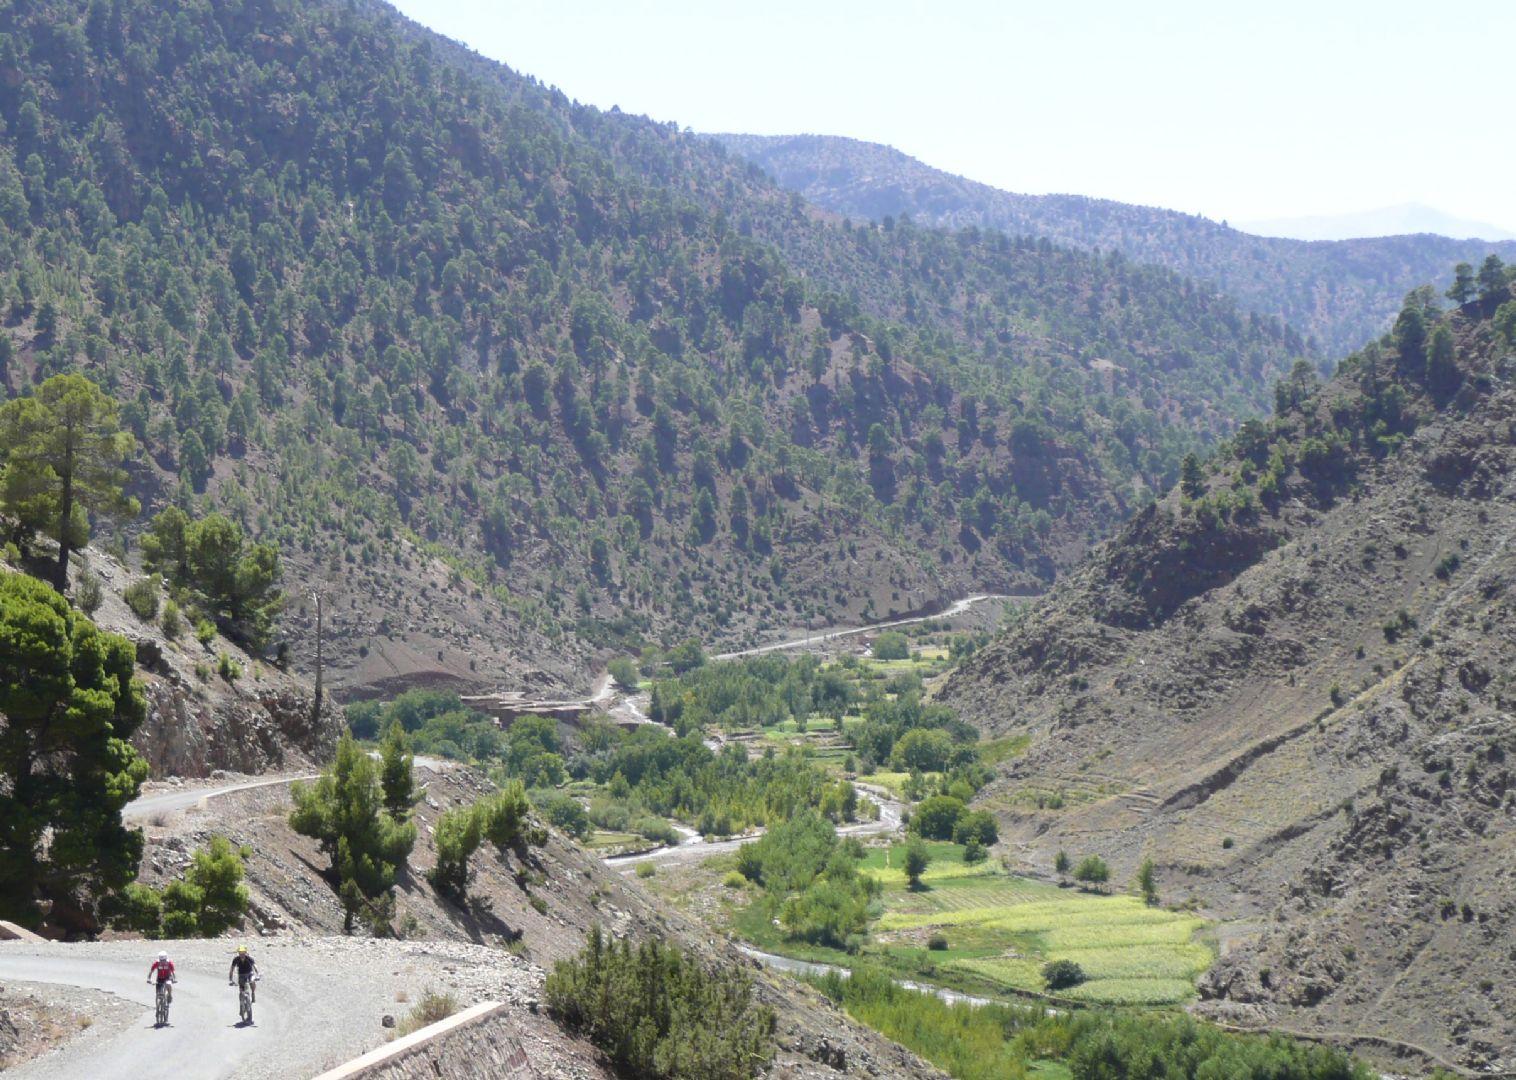 P1080123.jpg - Morocco - Atlas to Desert - Guided Mountain Bike Holiday - Mountain Biking